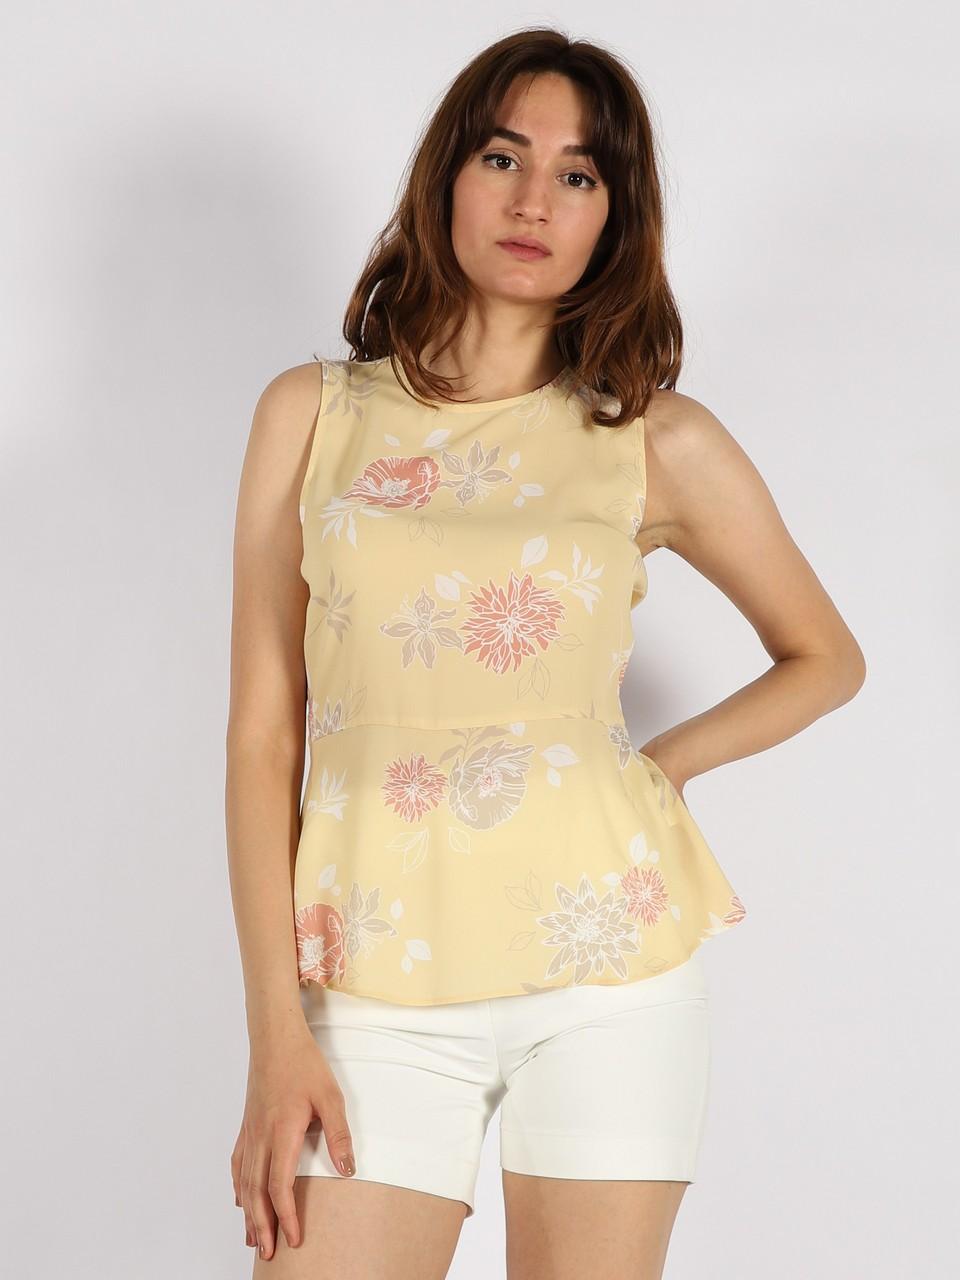 Flower Patterned Sleeveless Blouise